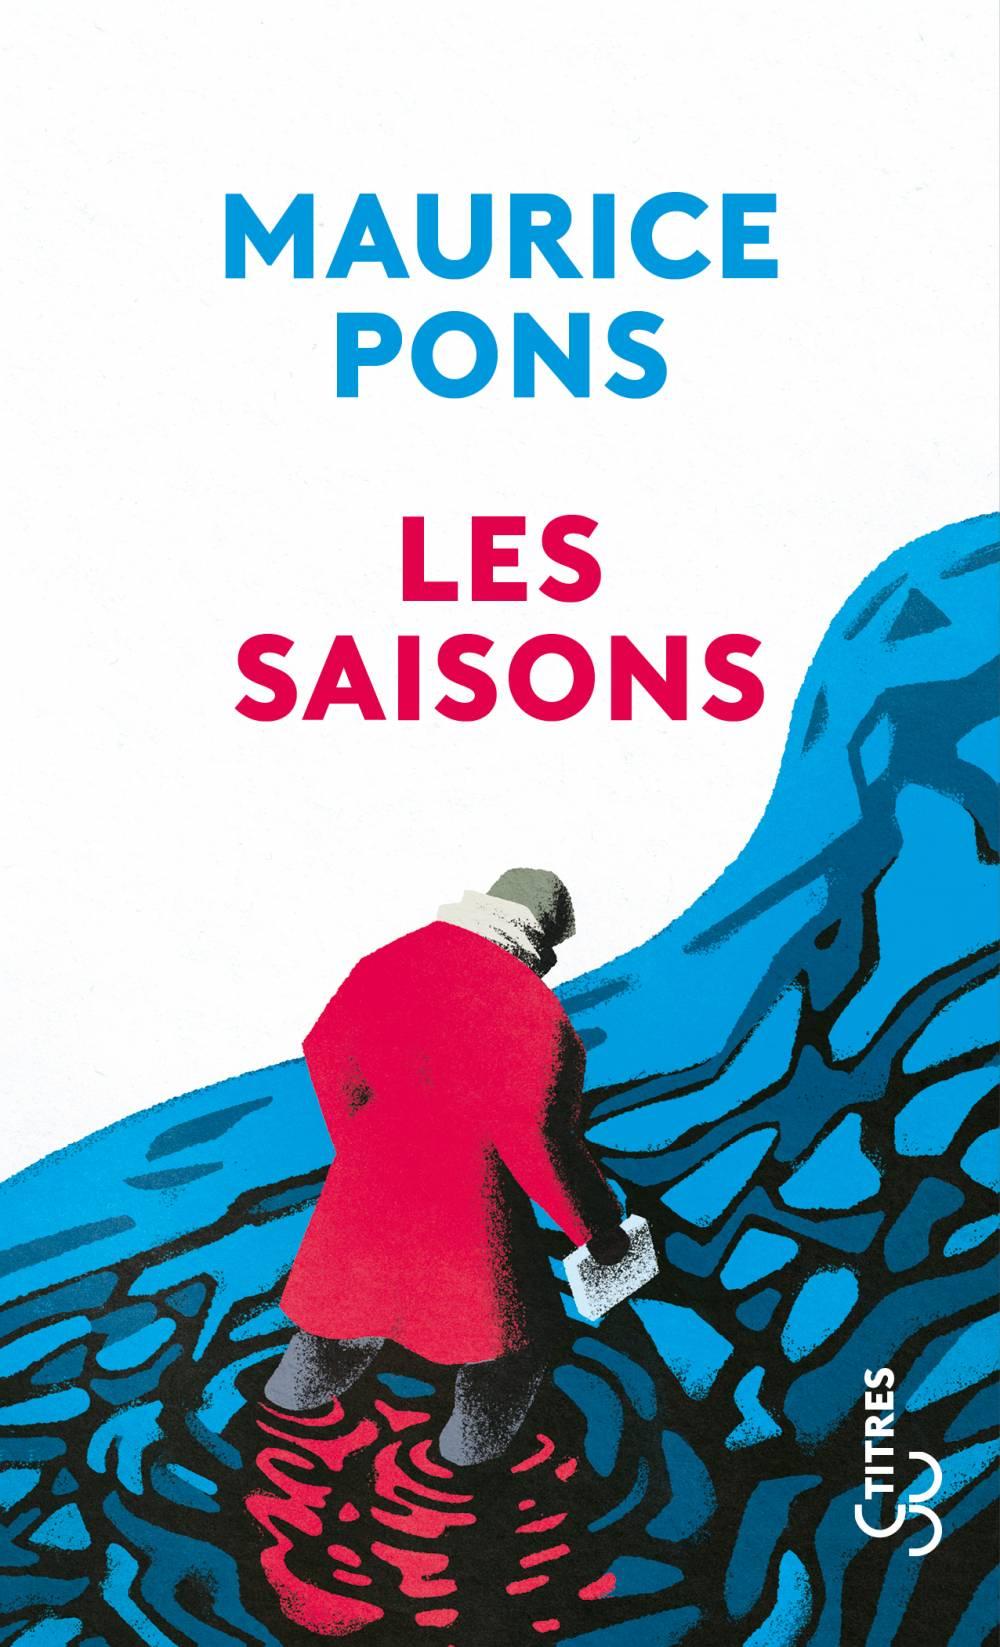 Maurice Pons, Les Saisons